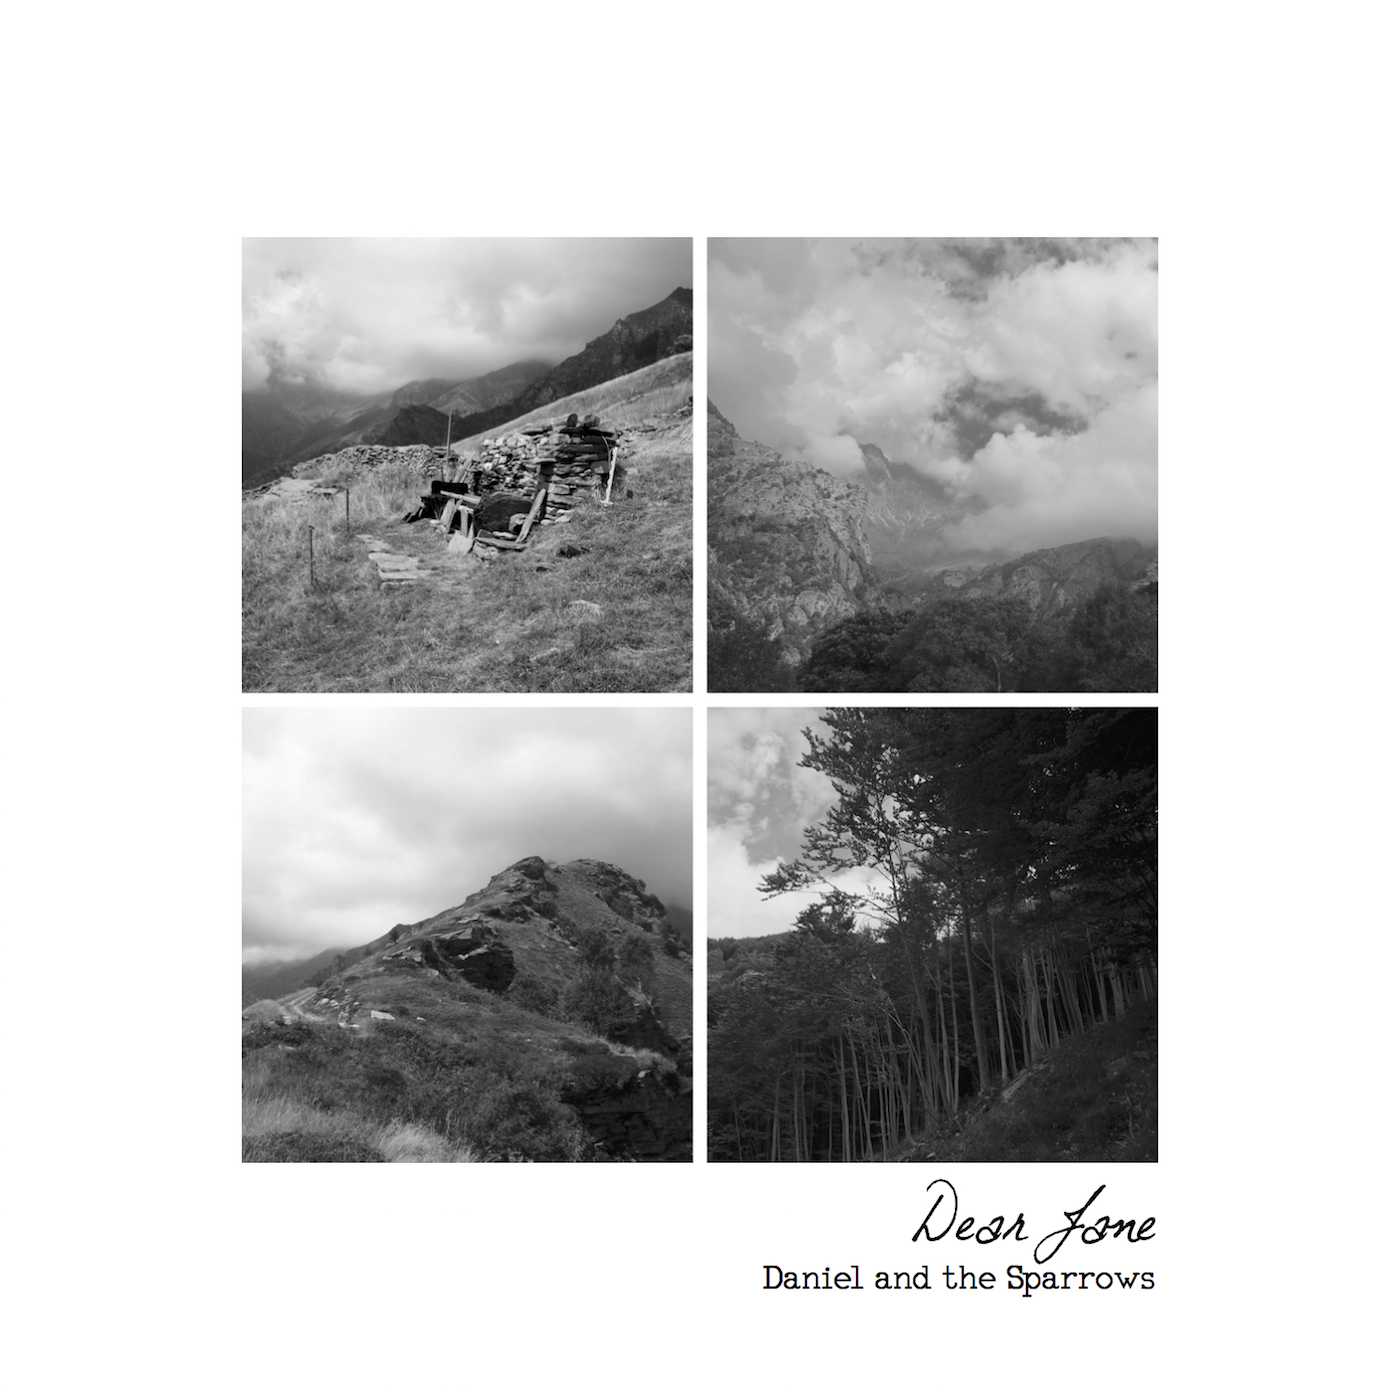 Dear Jane album art CD.jpg